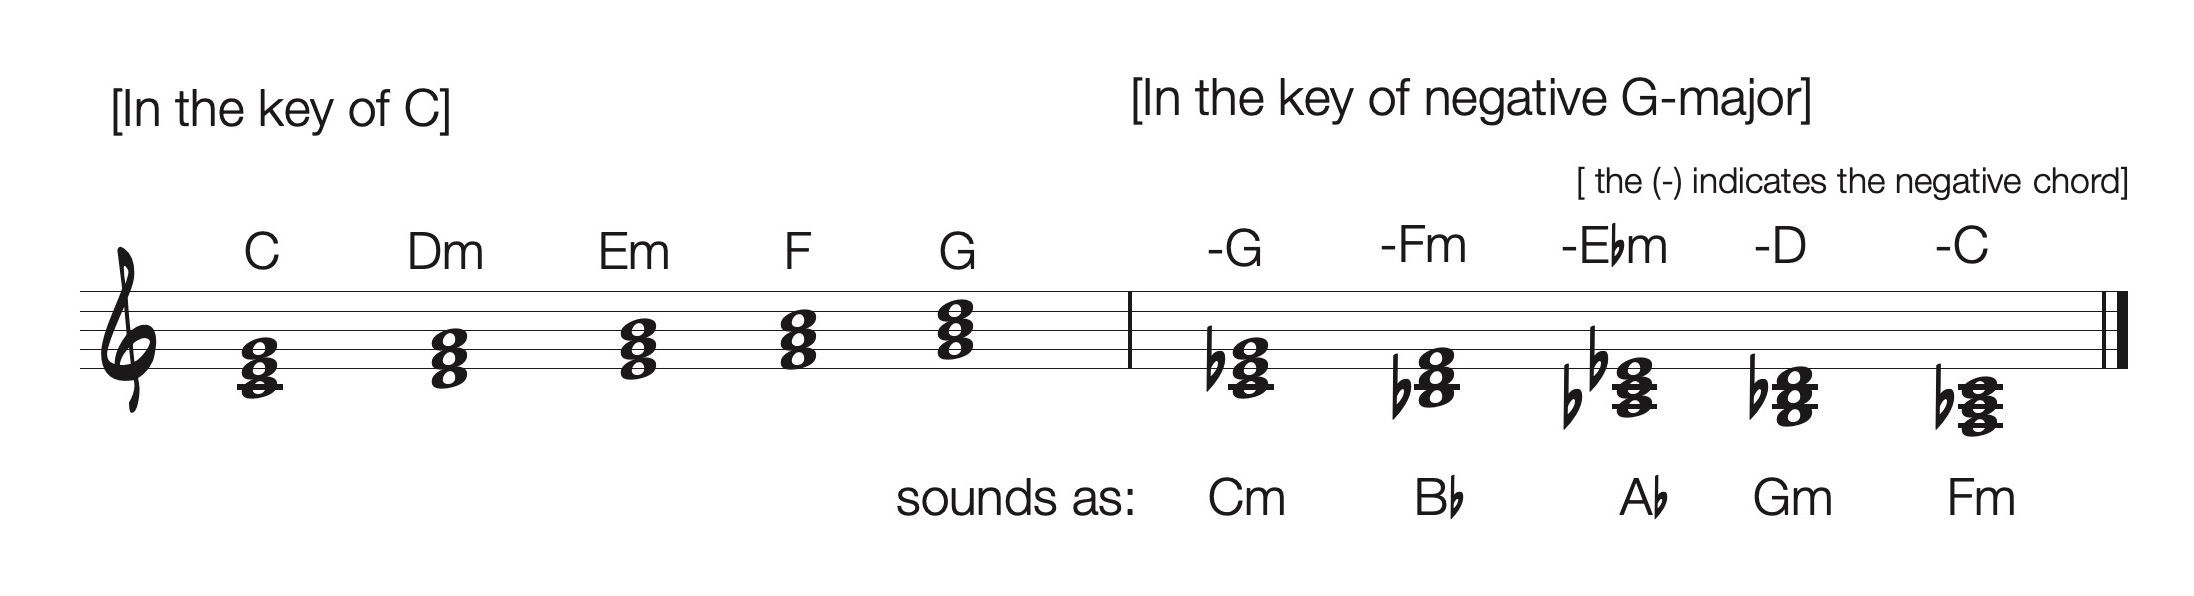 Negative Chords